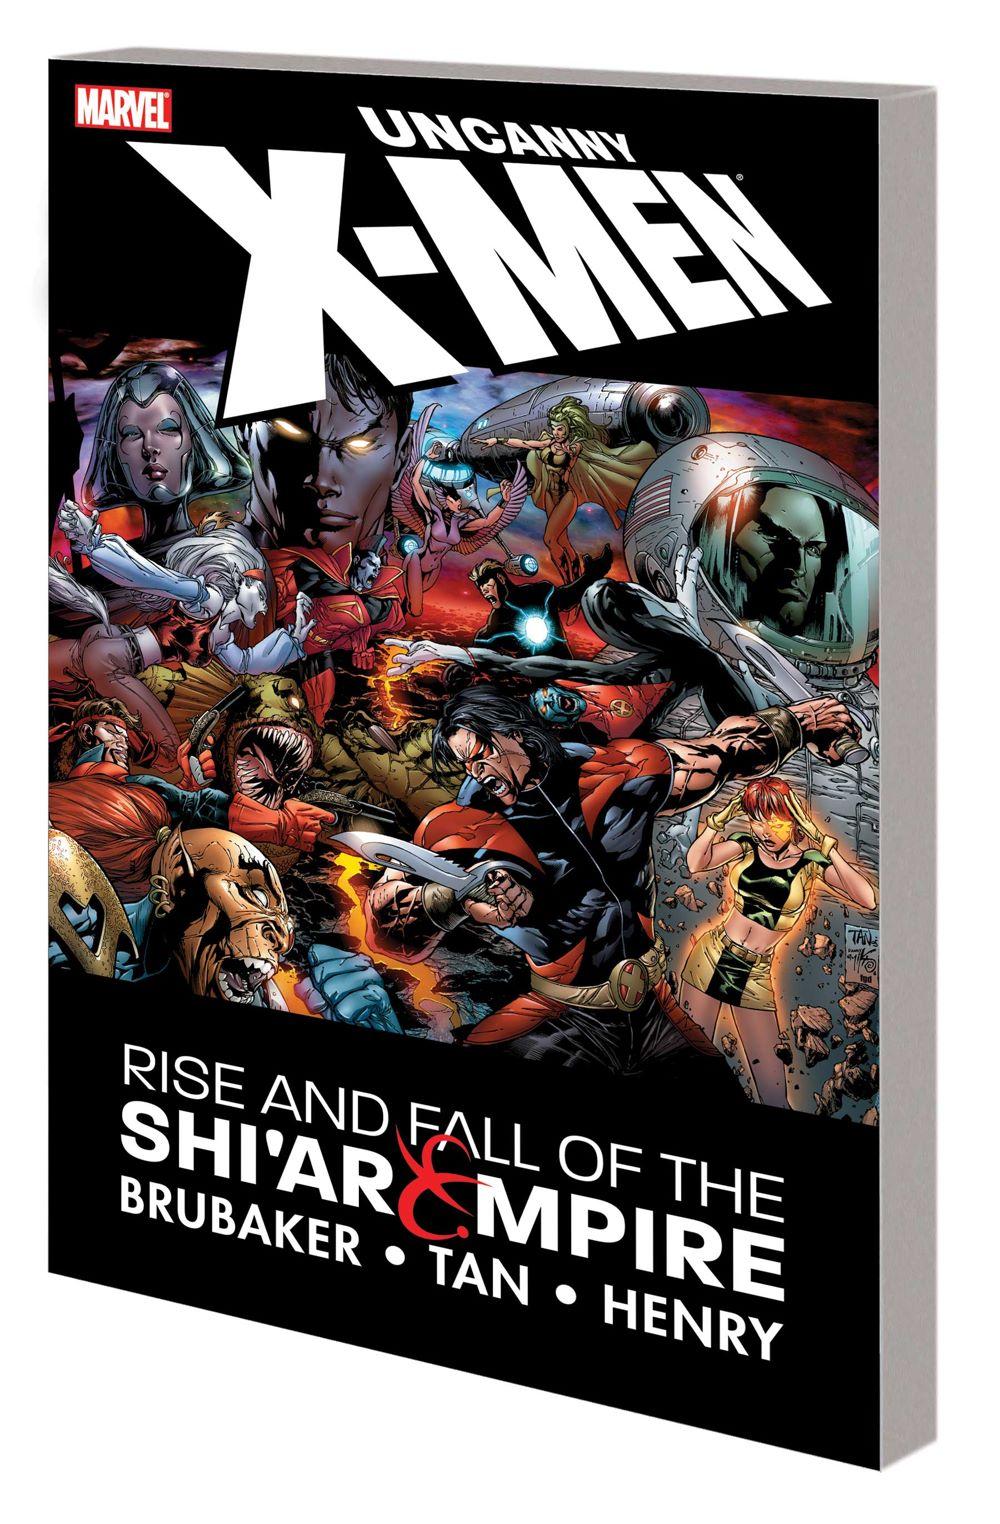 UNCXMEN_RISE_SHIAR_TPB Marvel Comics August 2021 Solicitations